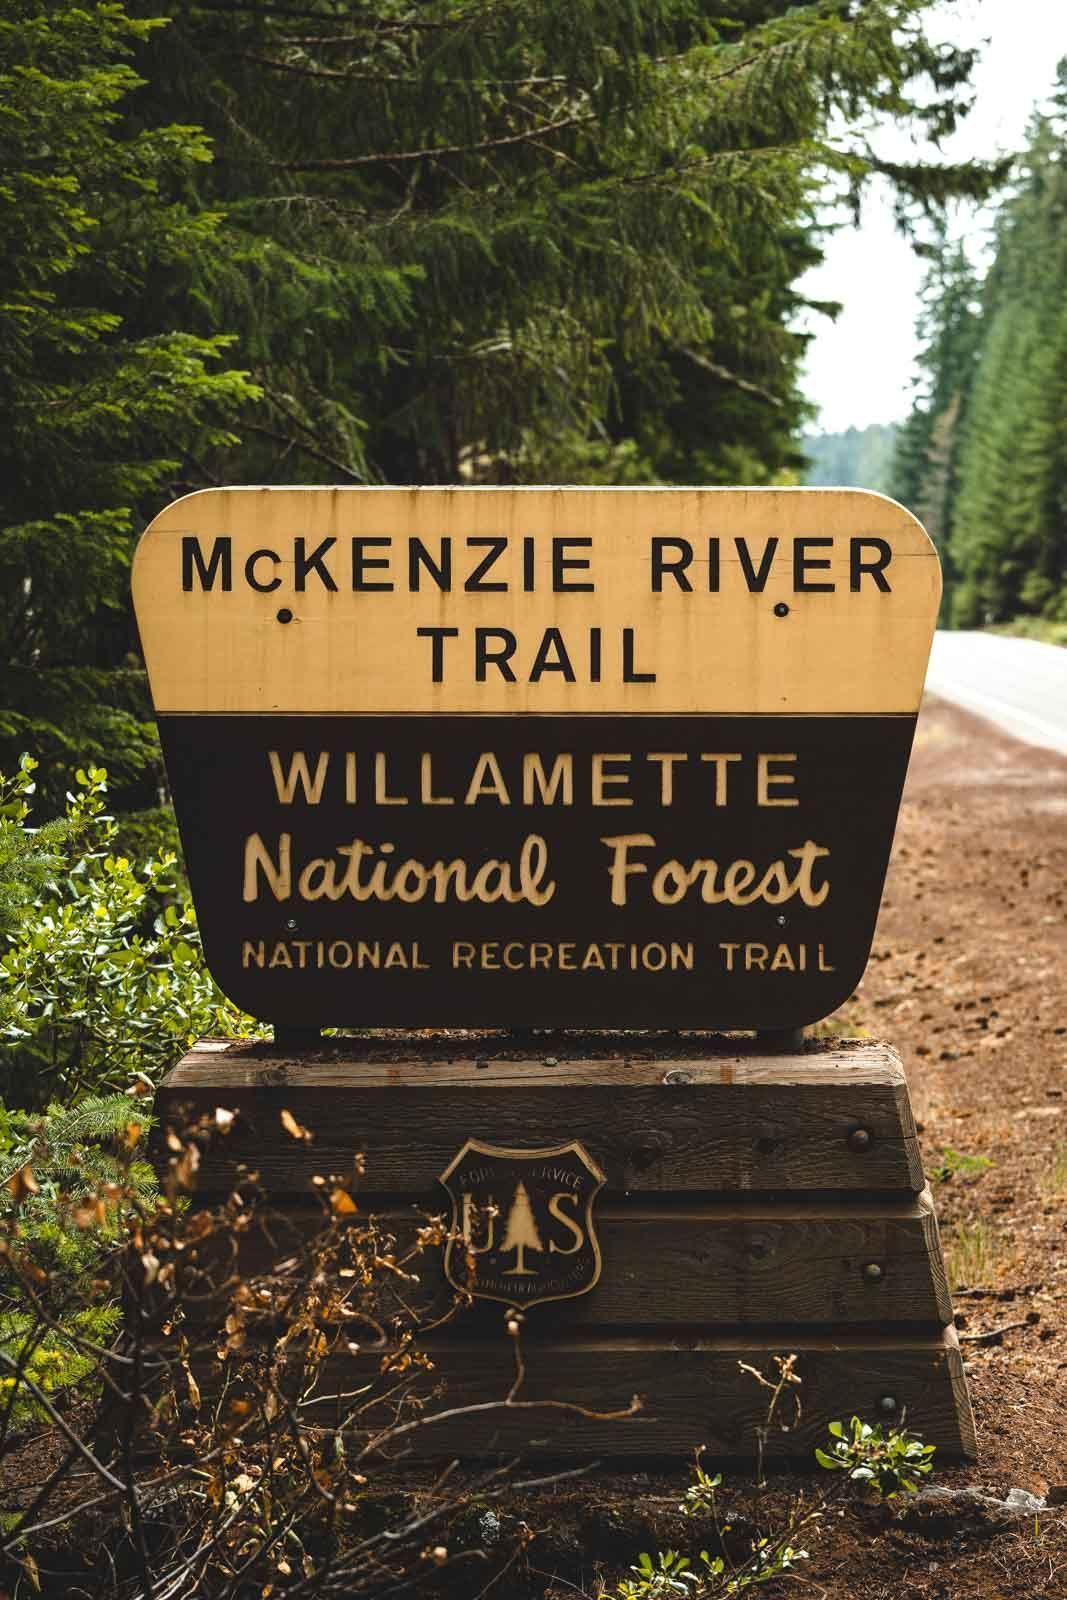 McKenzie River Trail sign